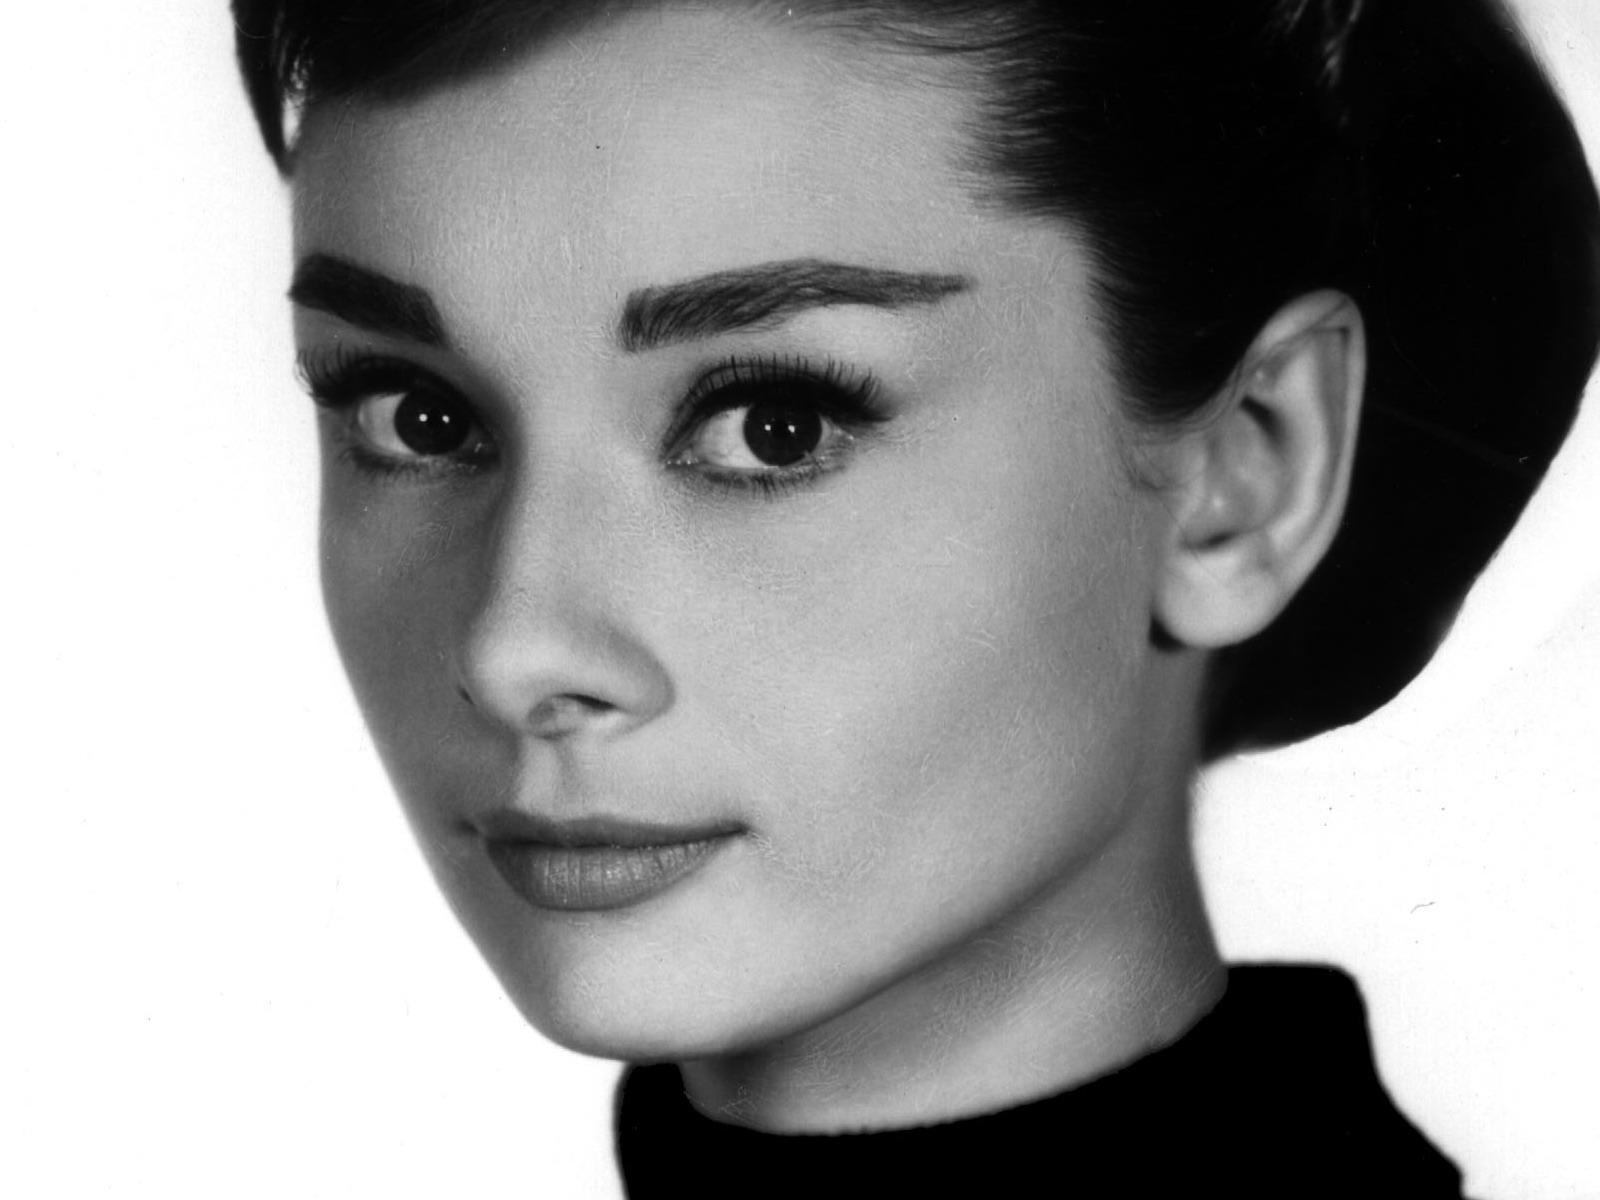 Beautiful Audrey Hepburn